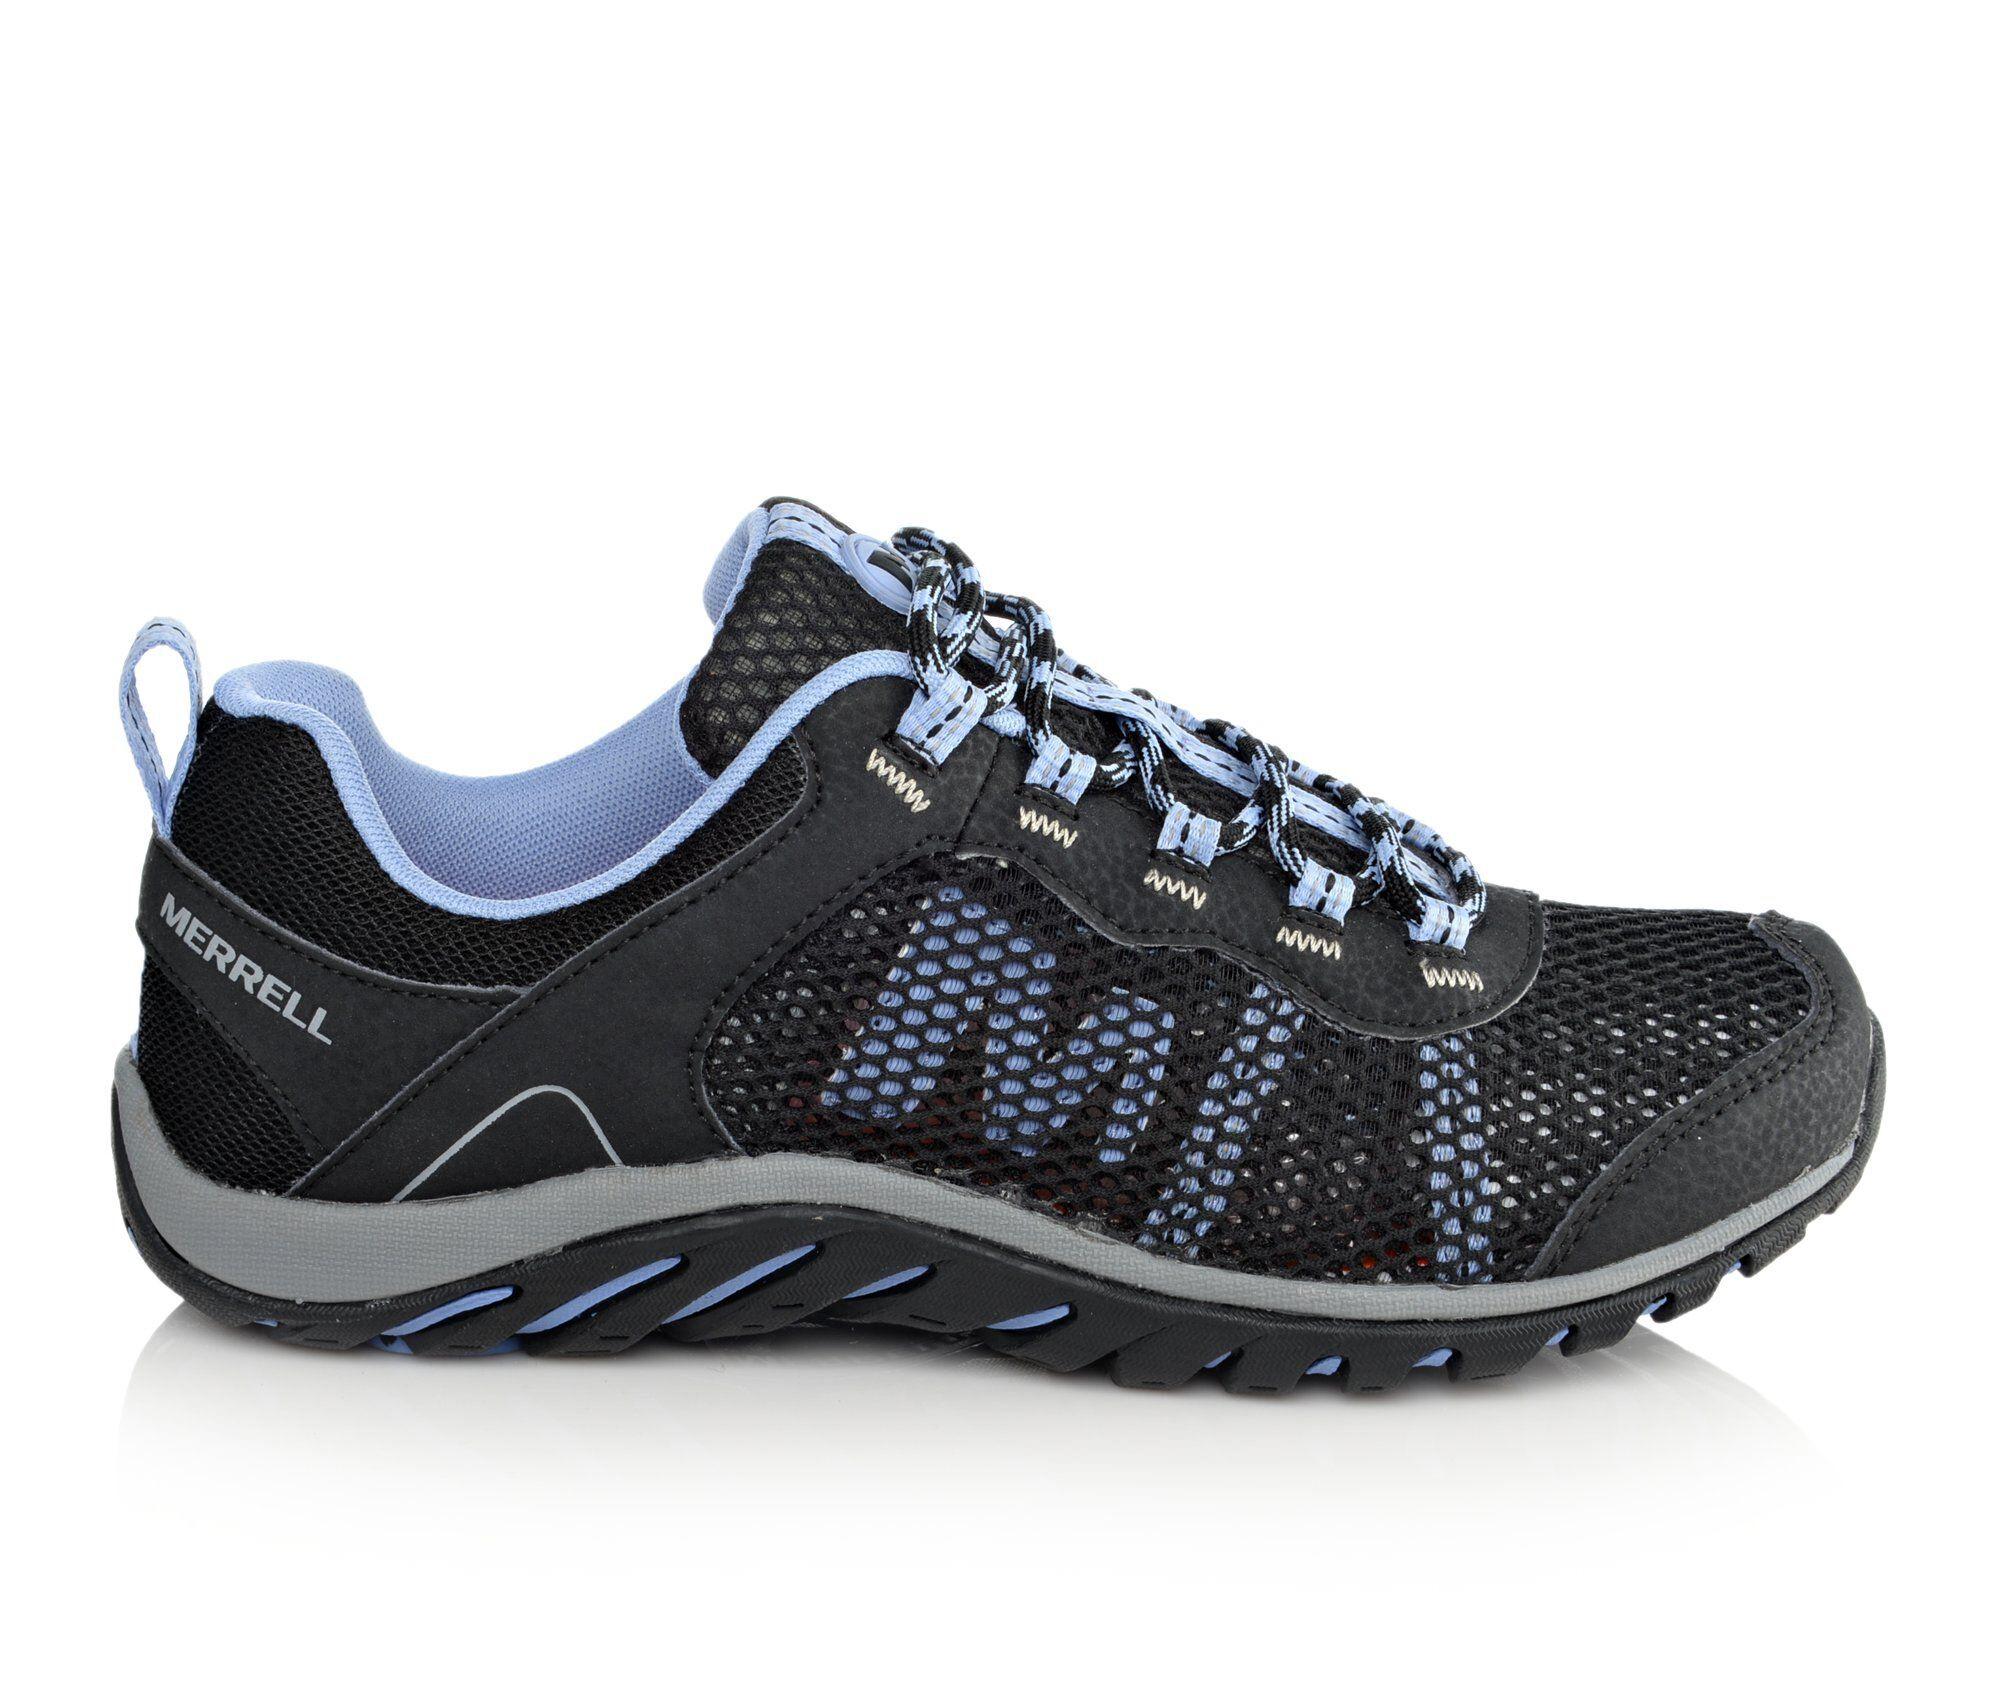 Women's Merrell Riverbed Hiking Shoes Black/Lavendar